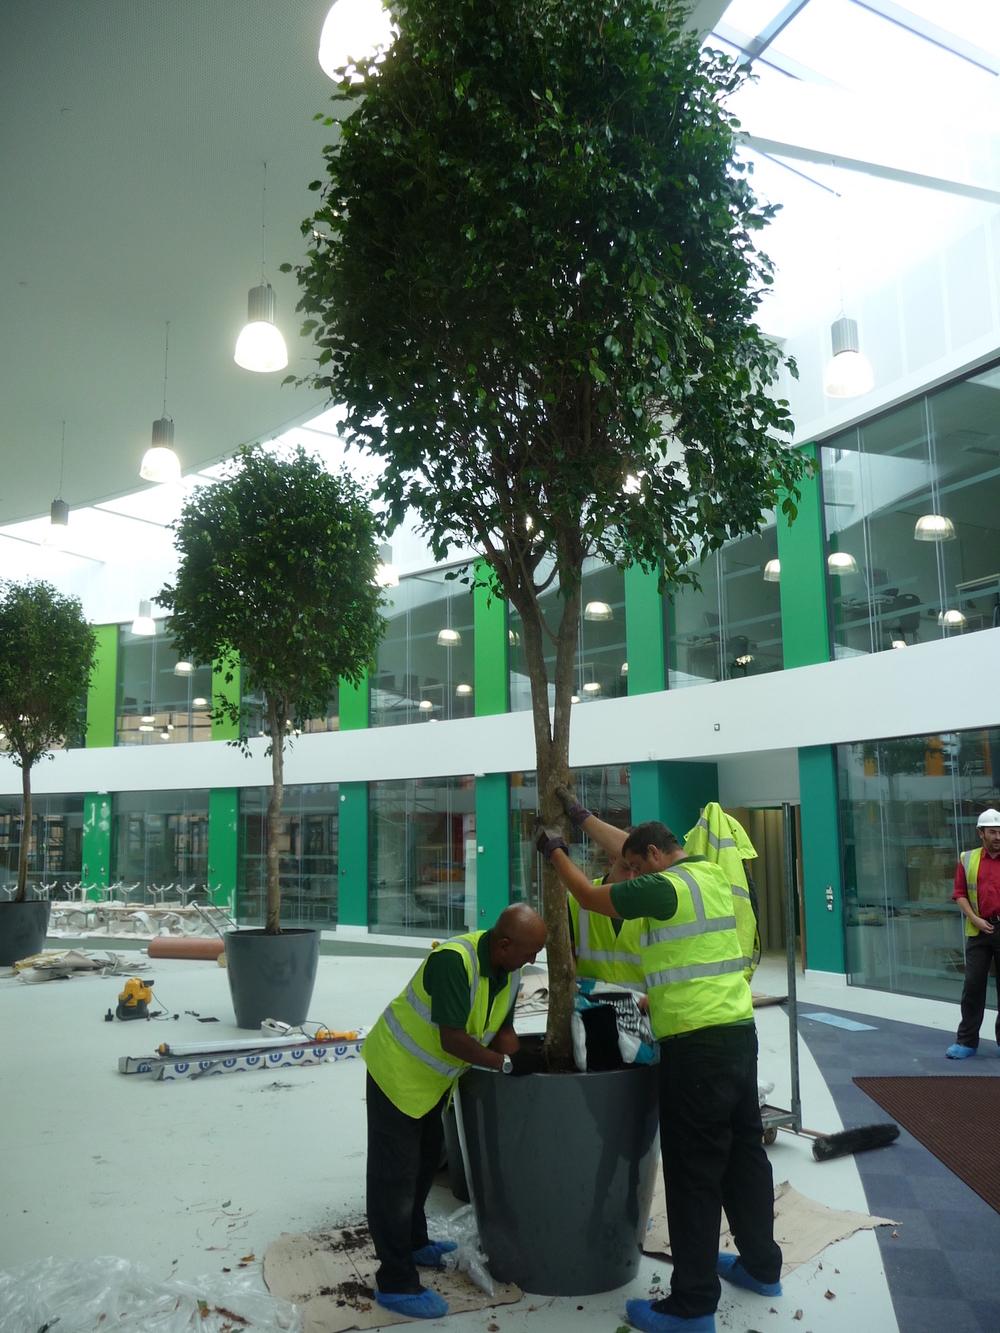 nailsea-school-plantcare-interior-plants-trees-bristol-cardiff-image-5